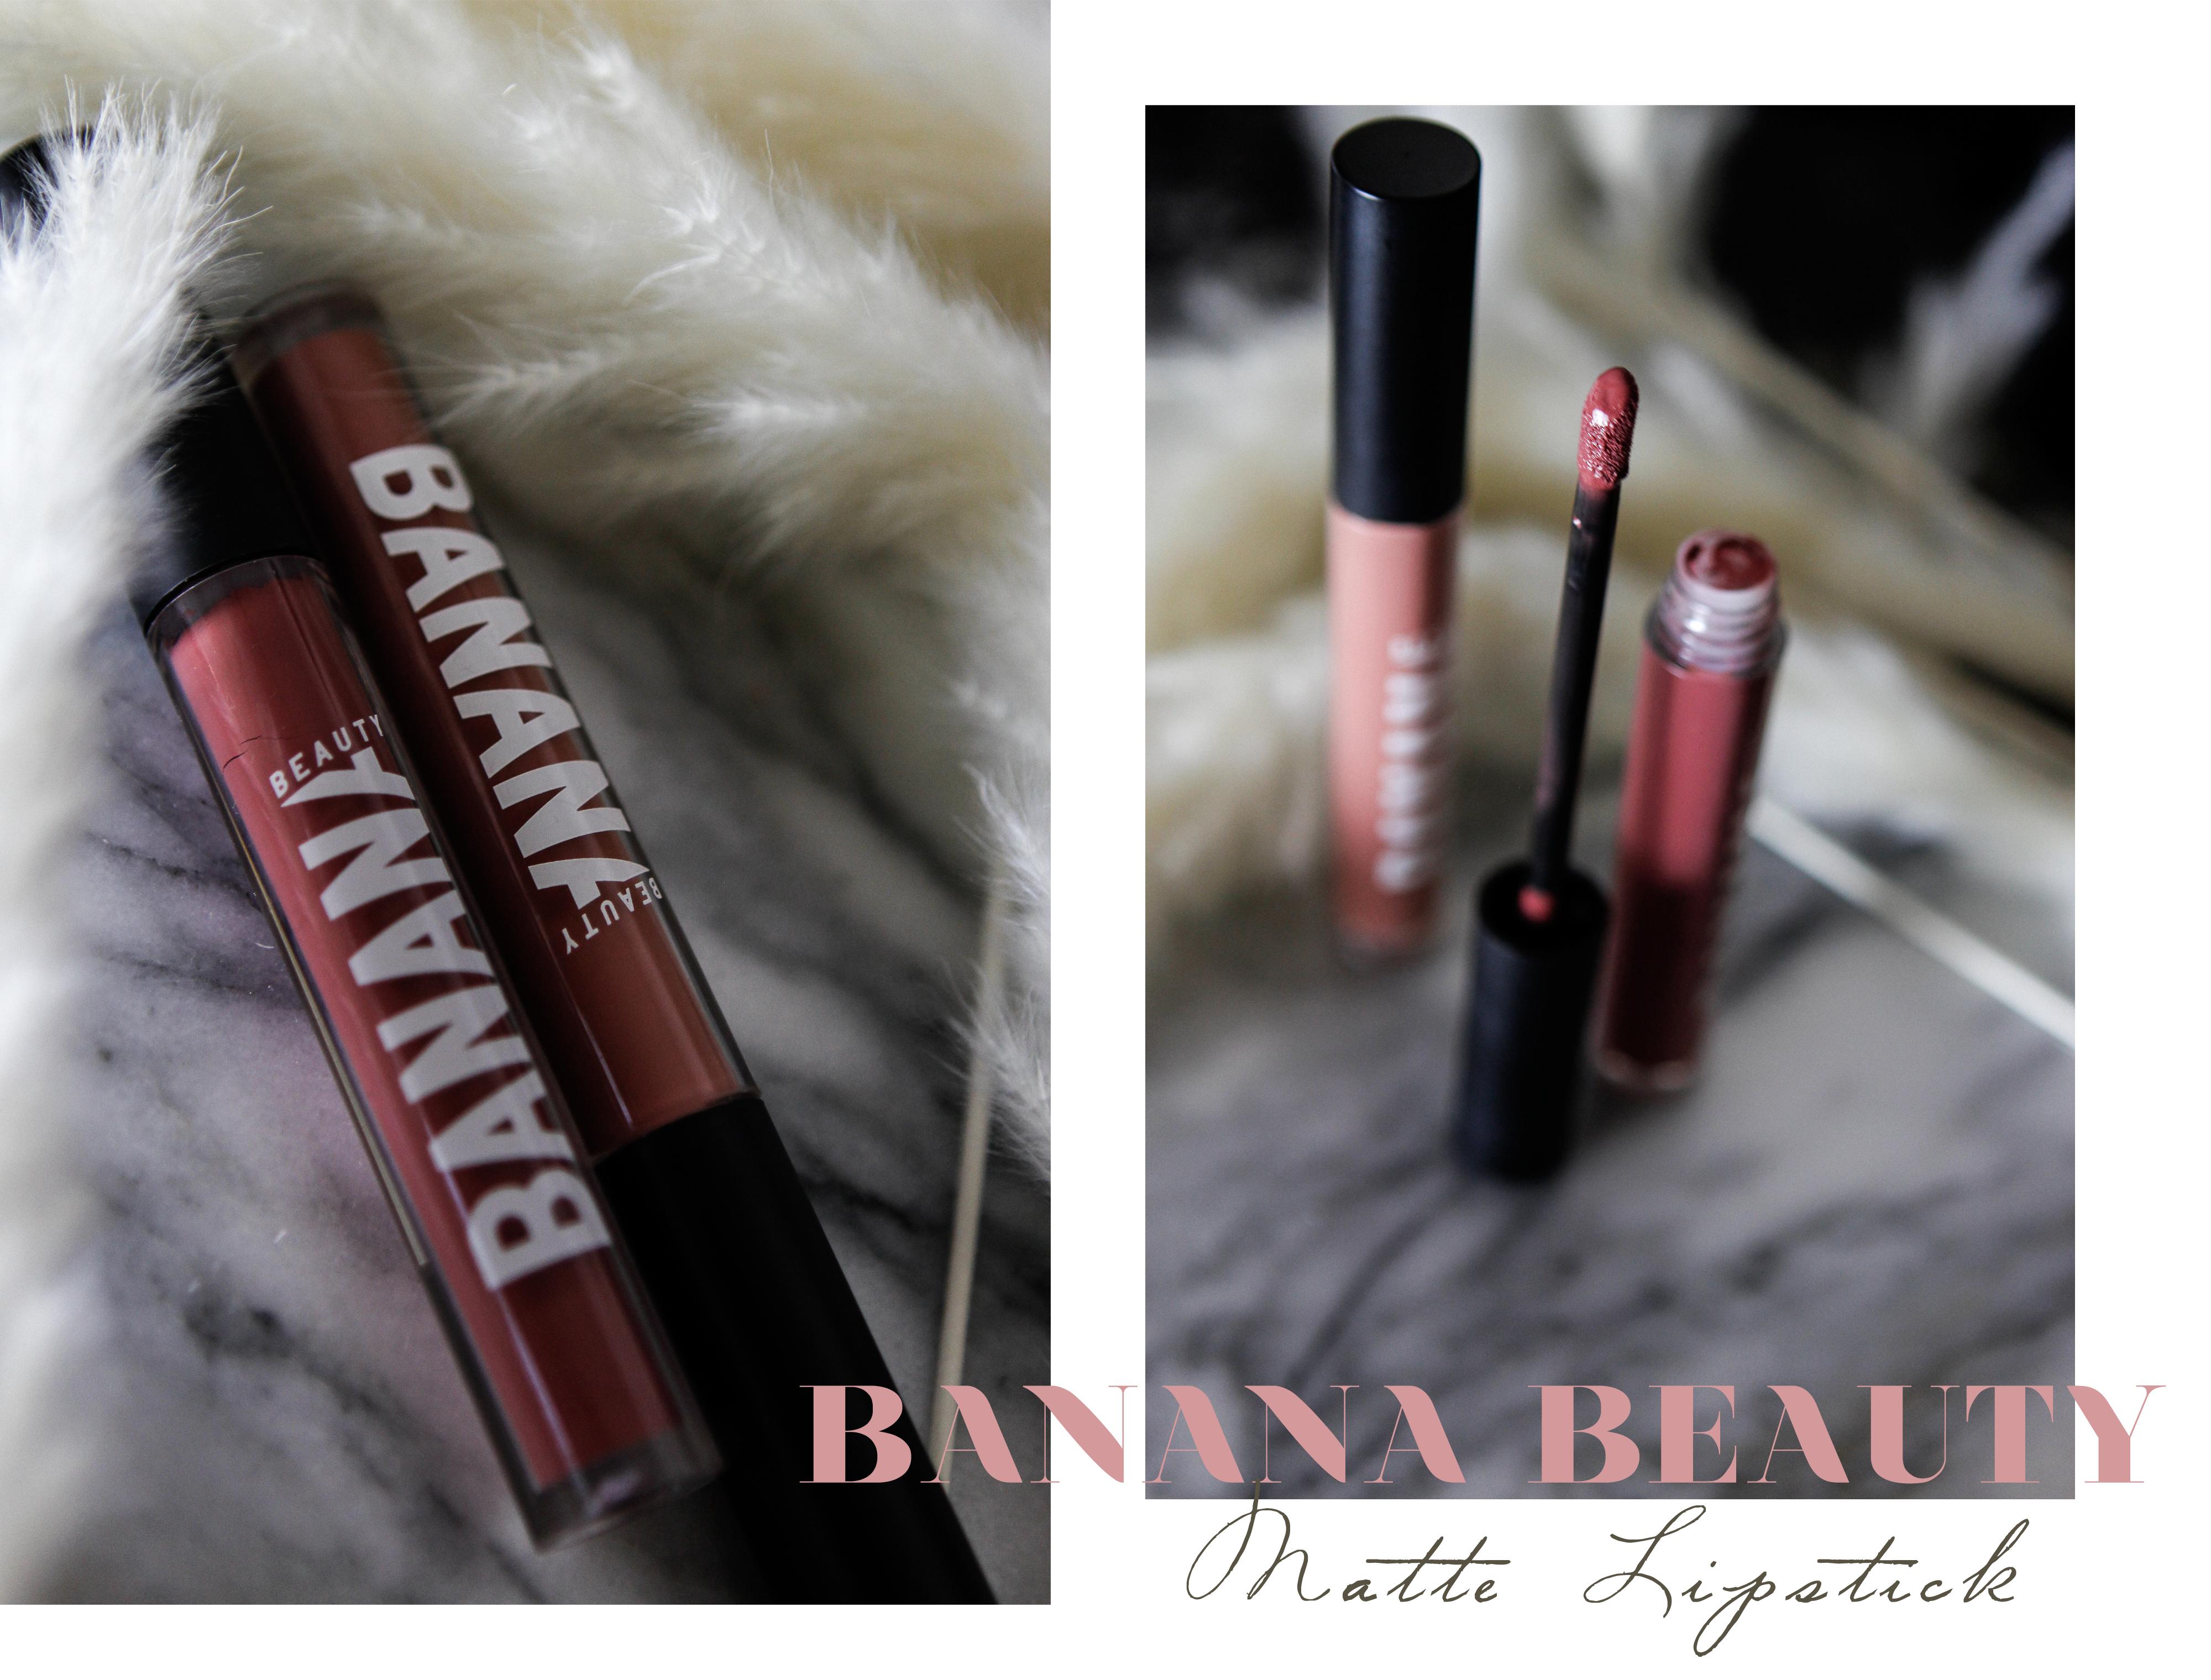 Lauralamode Beauty Blogger Belei Amazon Beauty Bananabeauty Beautyblogger Benefit Elf Cosmetic Gosh Mugler Parfum Berlin Fashionblogger